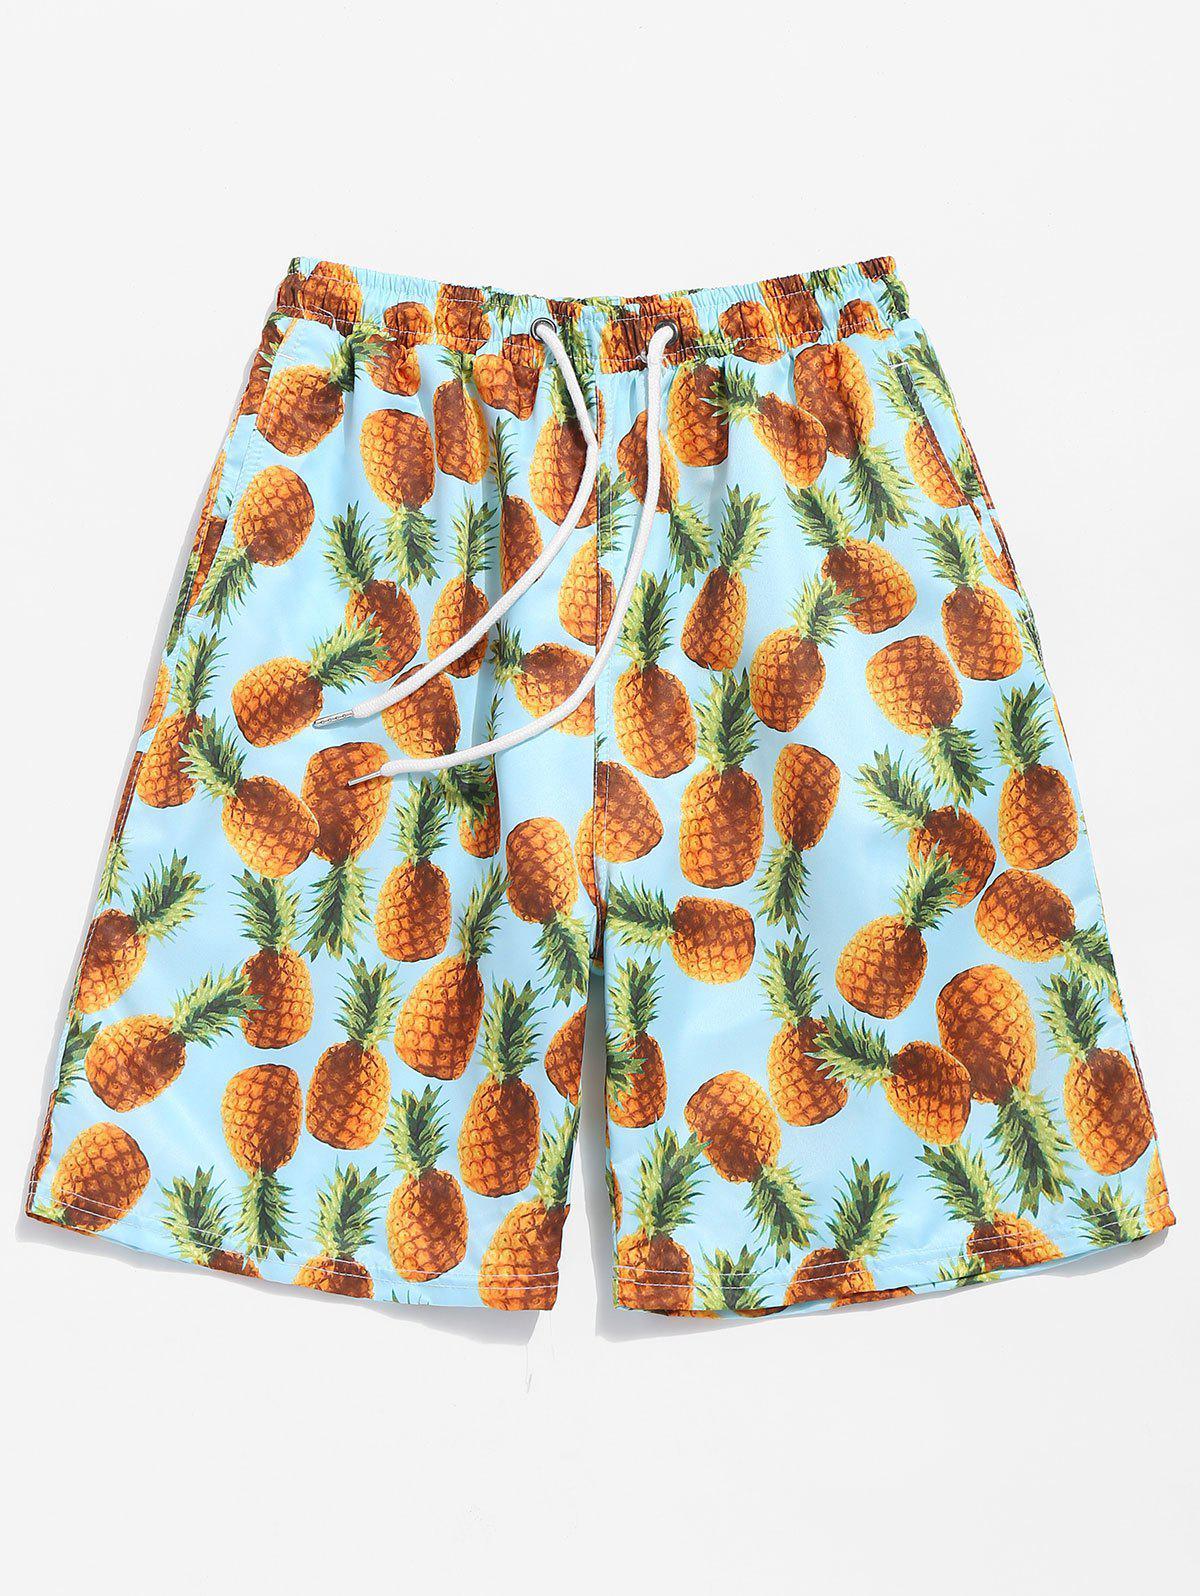 Back Flap Pocket Pineapple Print Beach Shorts